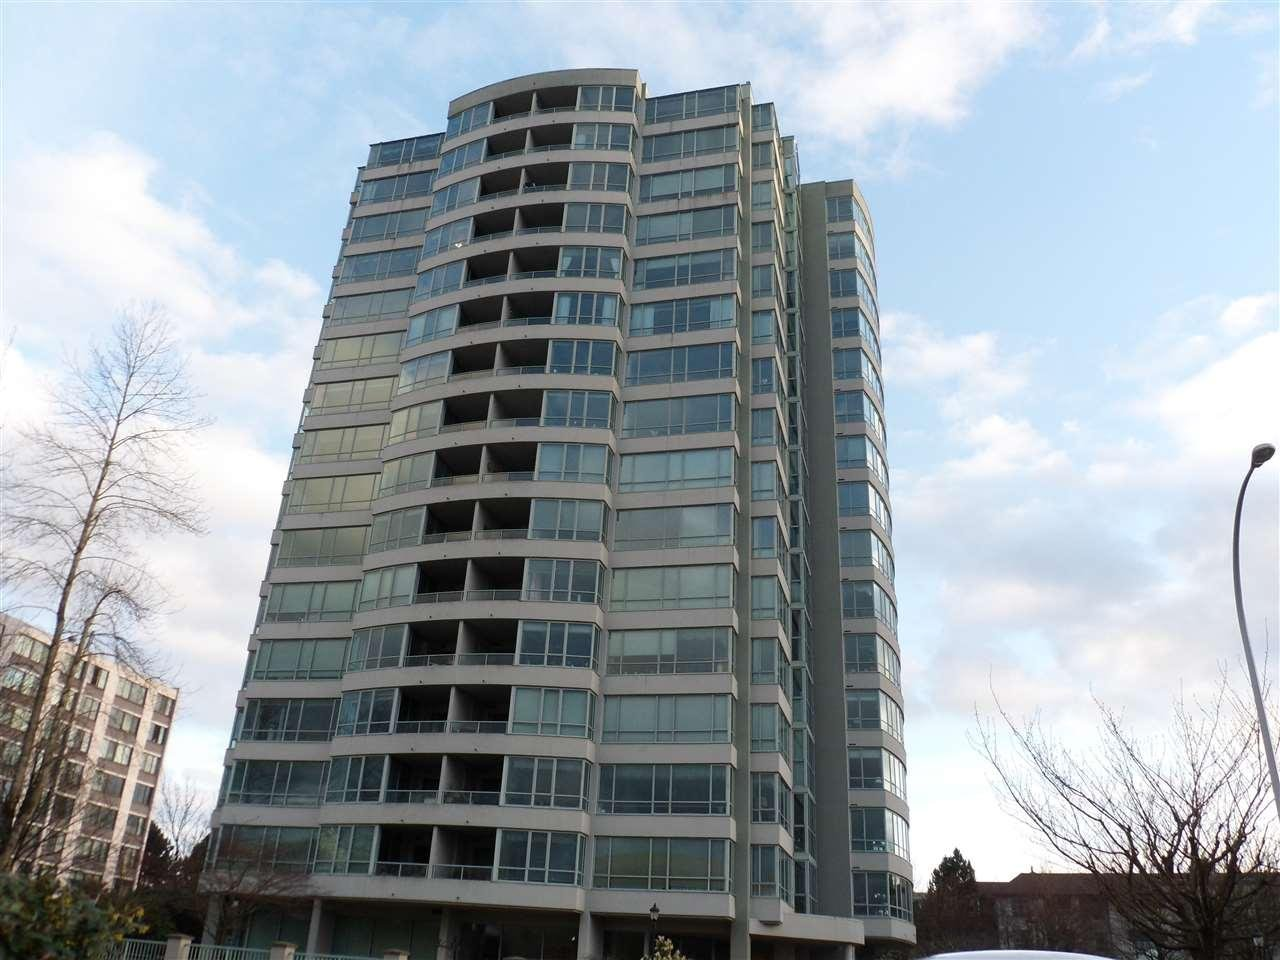 R2046529 - 504 15038 101 AVENUE, Guildford, Surrey, BC - Apartment Unit